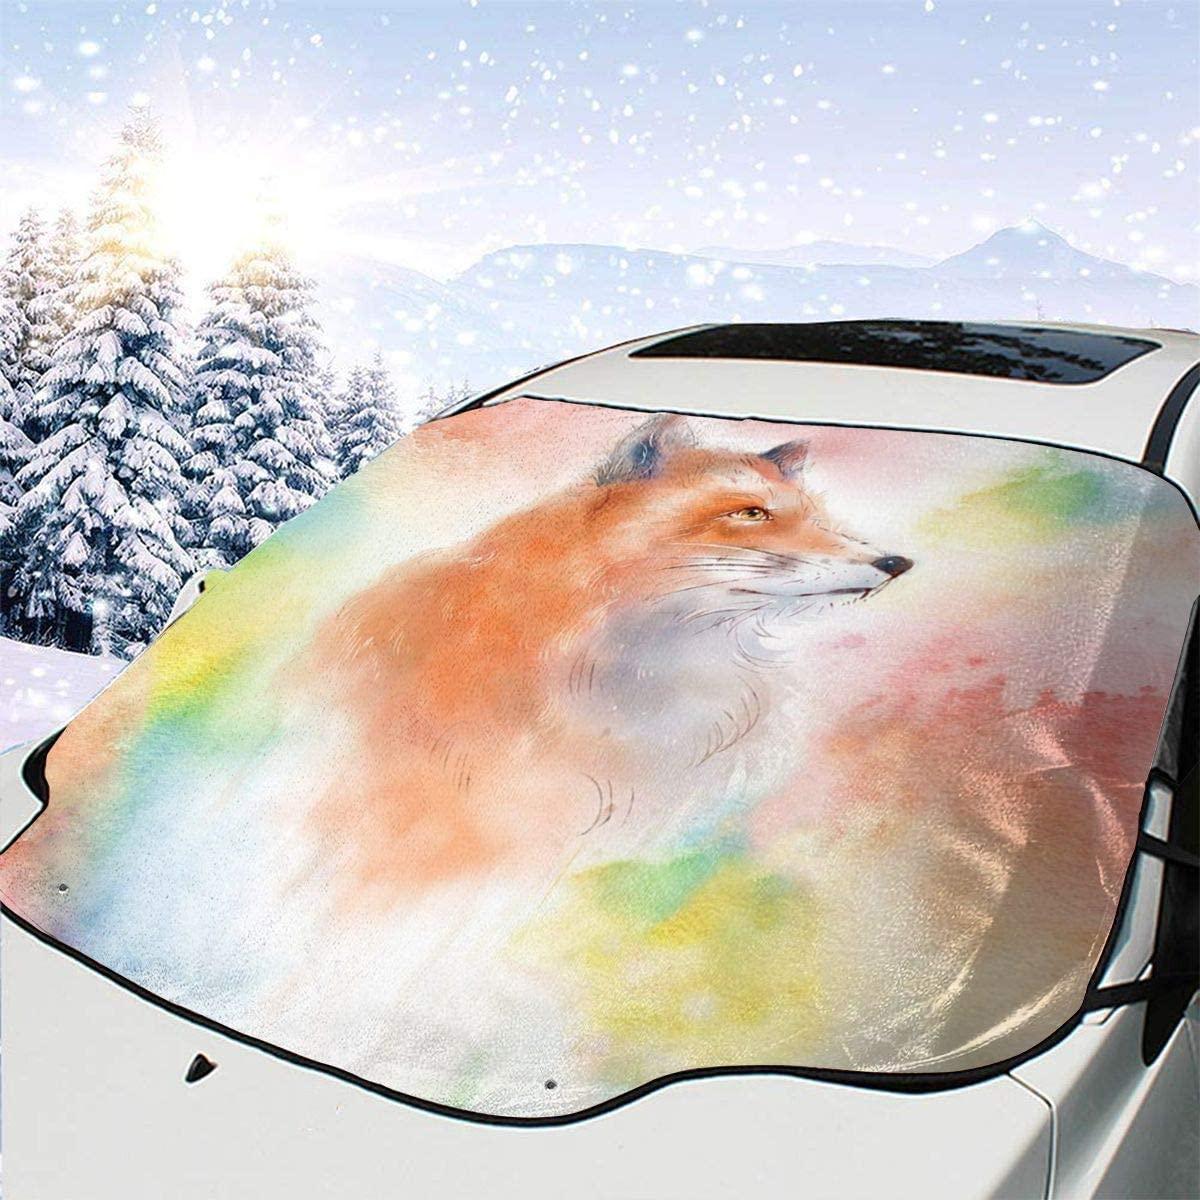 THONFIRE Car Front Window Windshields Winter Sun Shades Colorful Cartoon Fox Cover Rainproof Blocks UV Rays Damage Free Visor Protector Auto Summer Heat Insulation